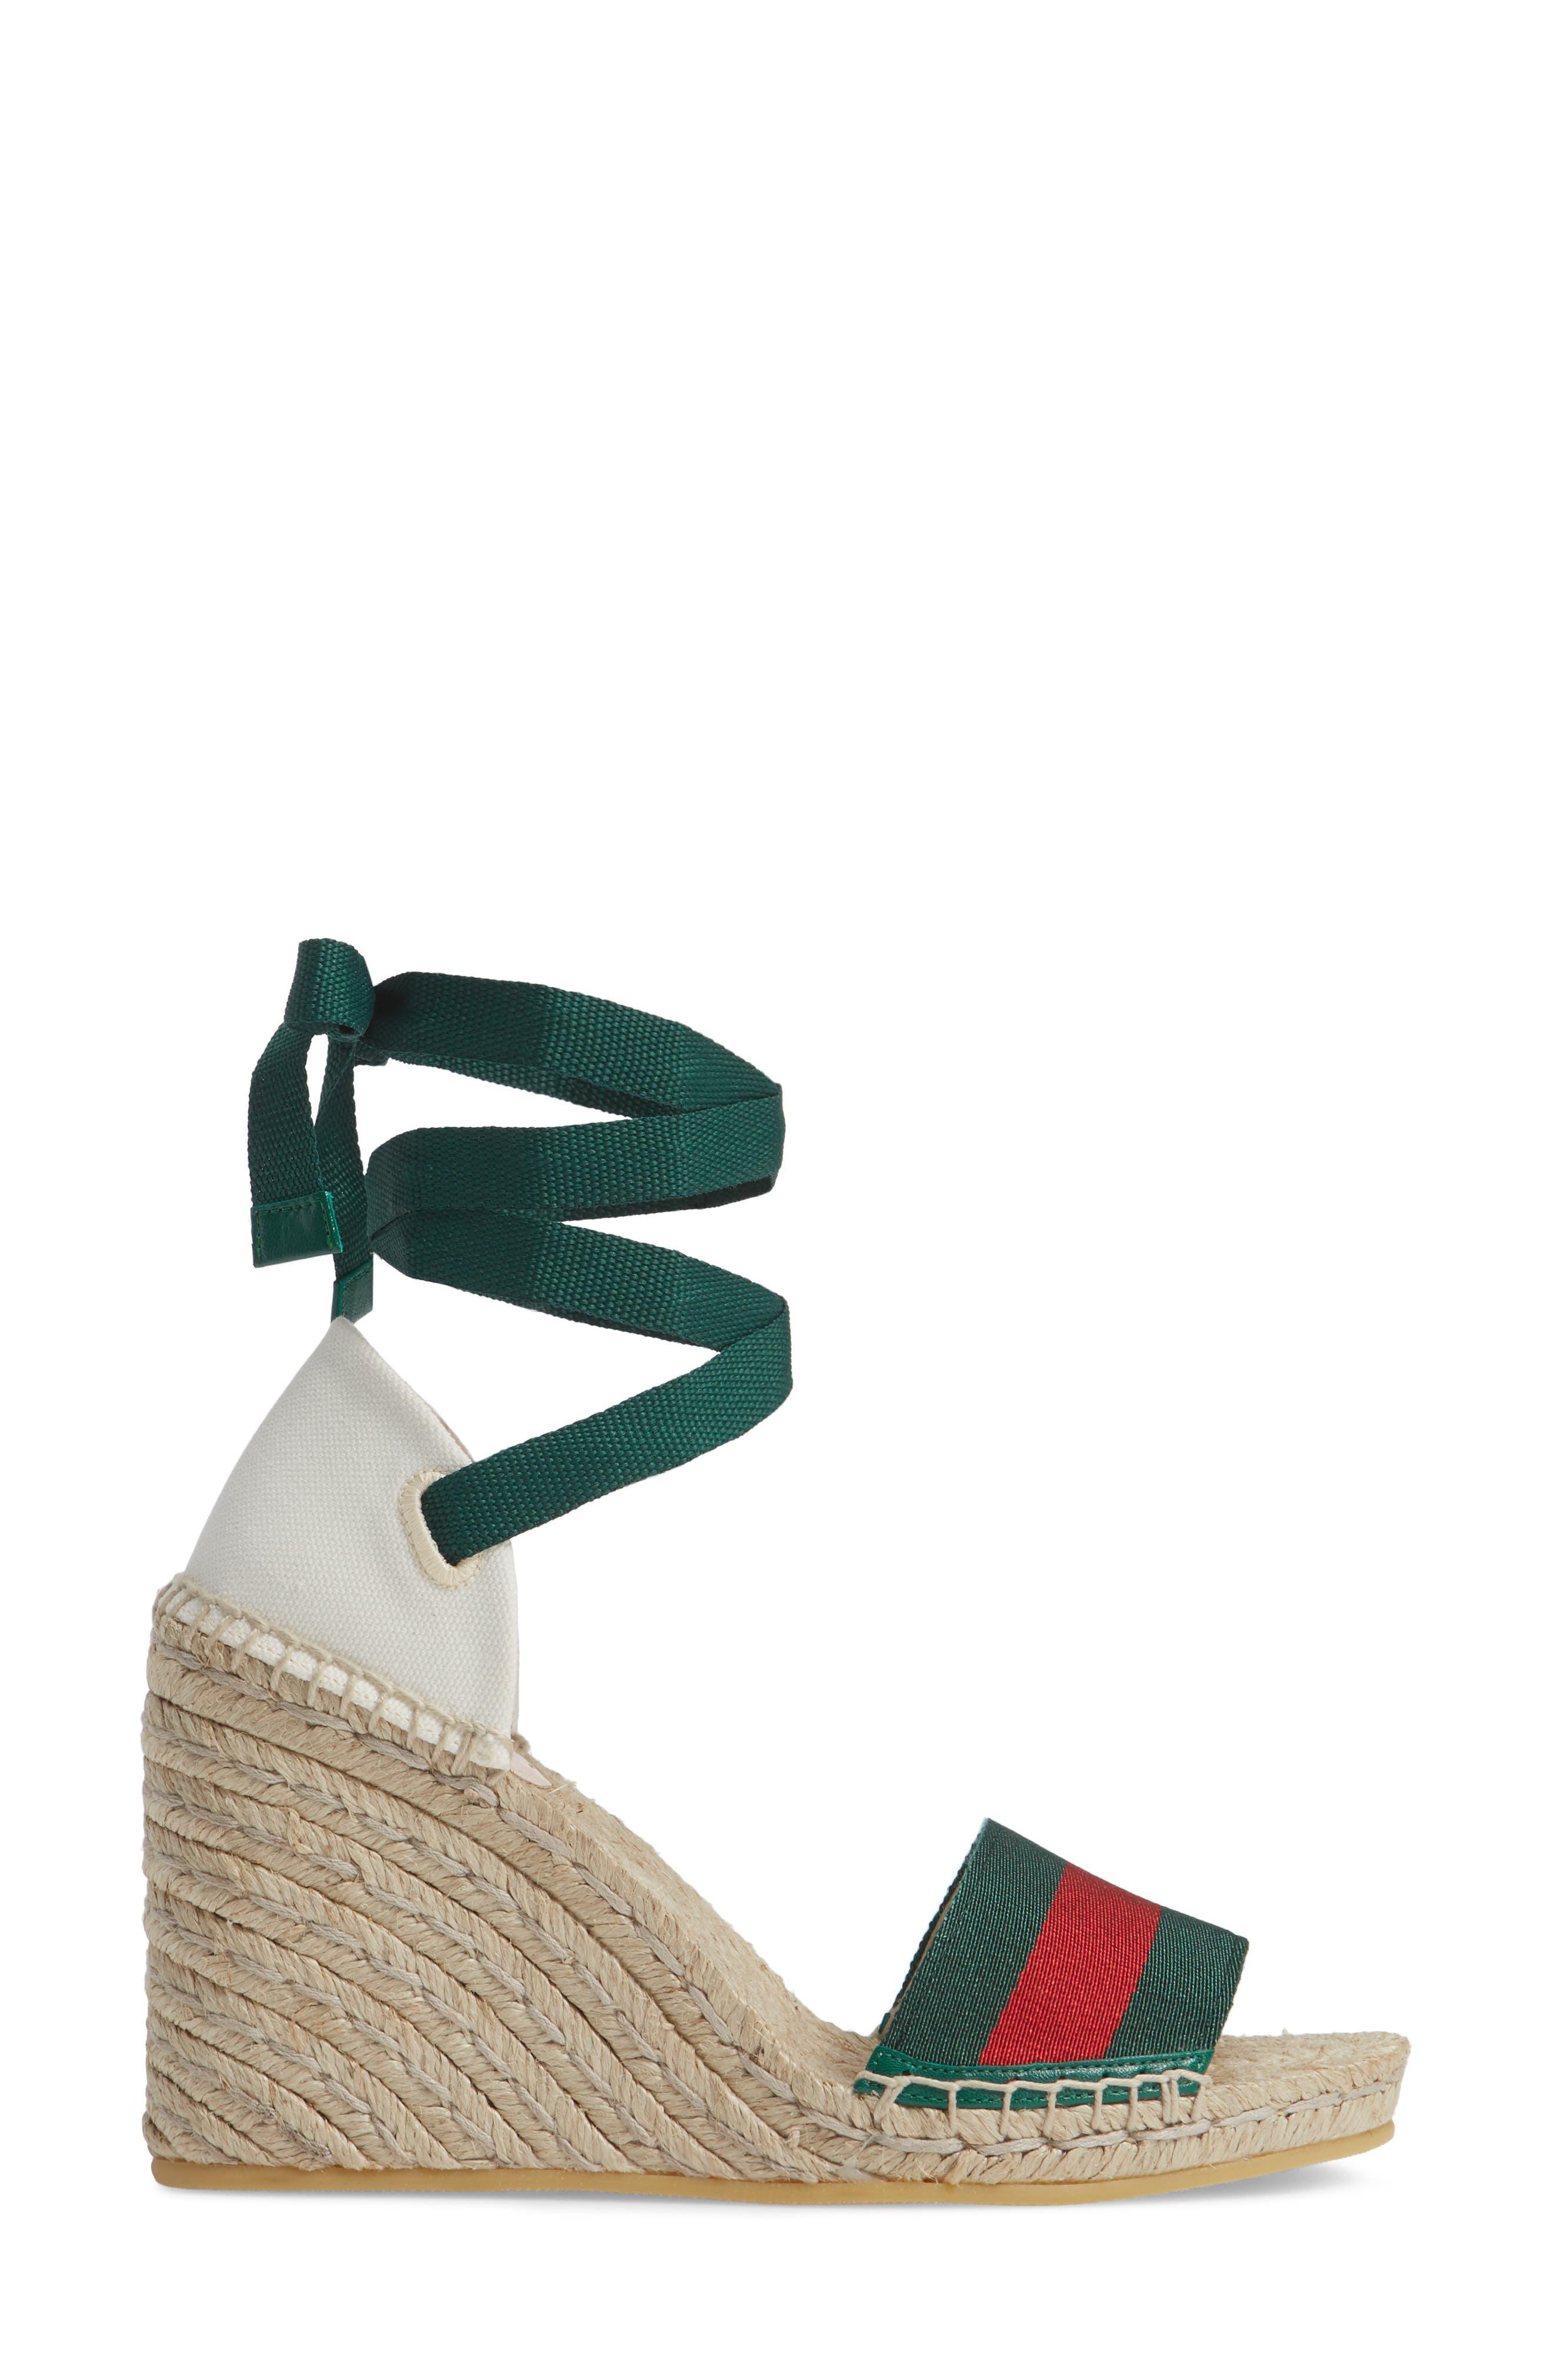 GUCCI, Lilibeth Sylvie Web Espadrille Wedge Sandal, Alternate thumbnail 3, color, WHITE/ GREEN